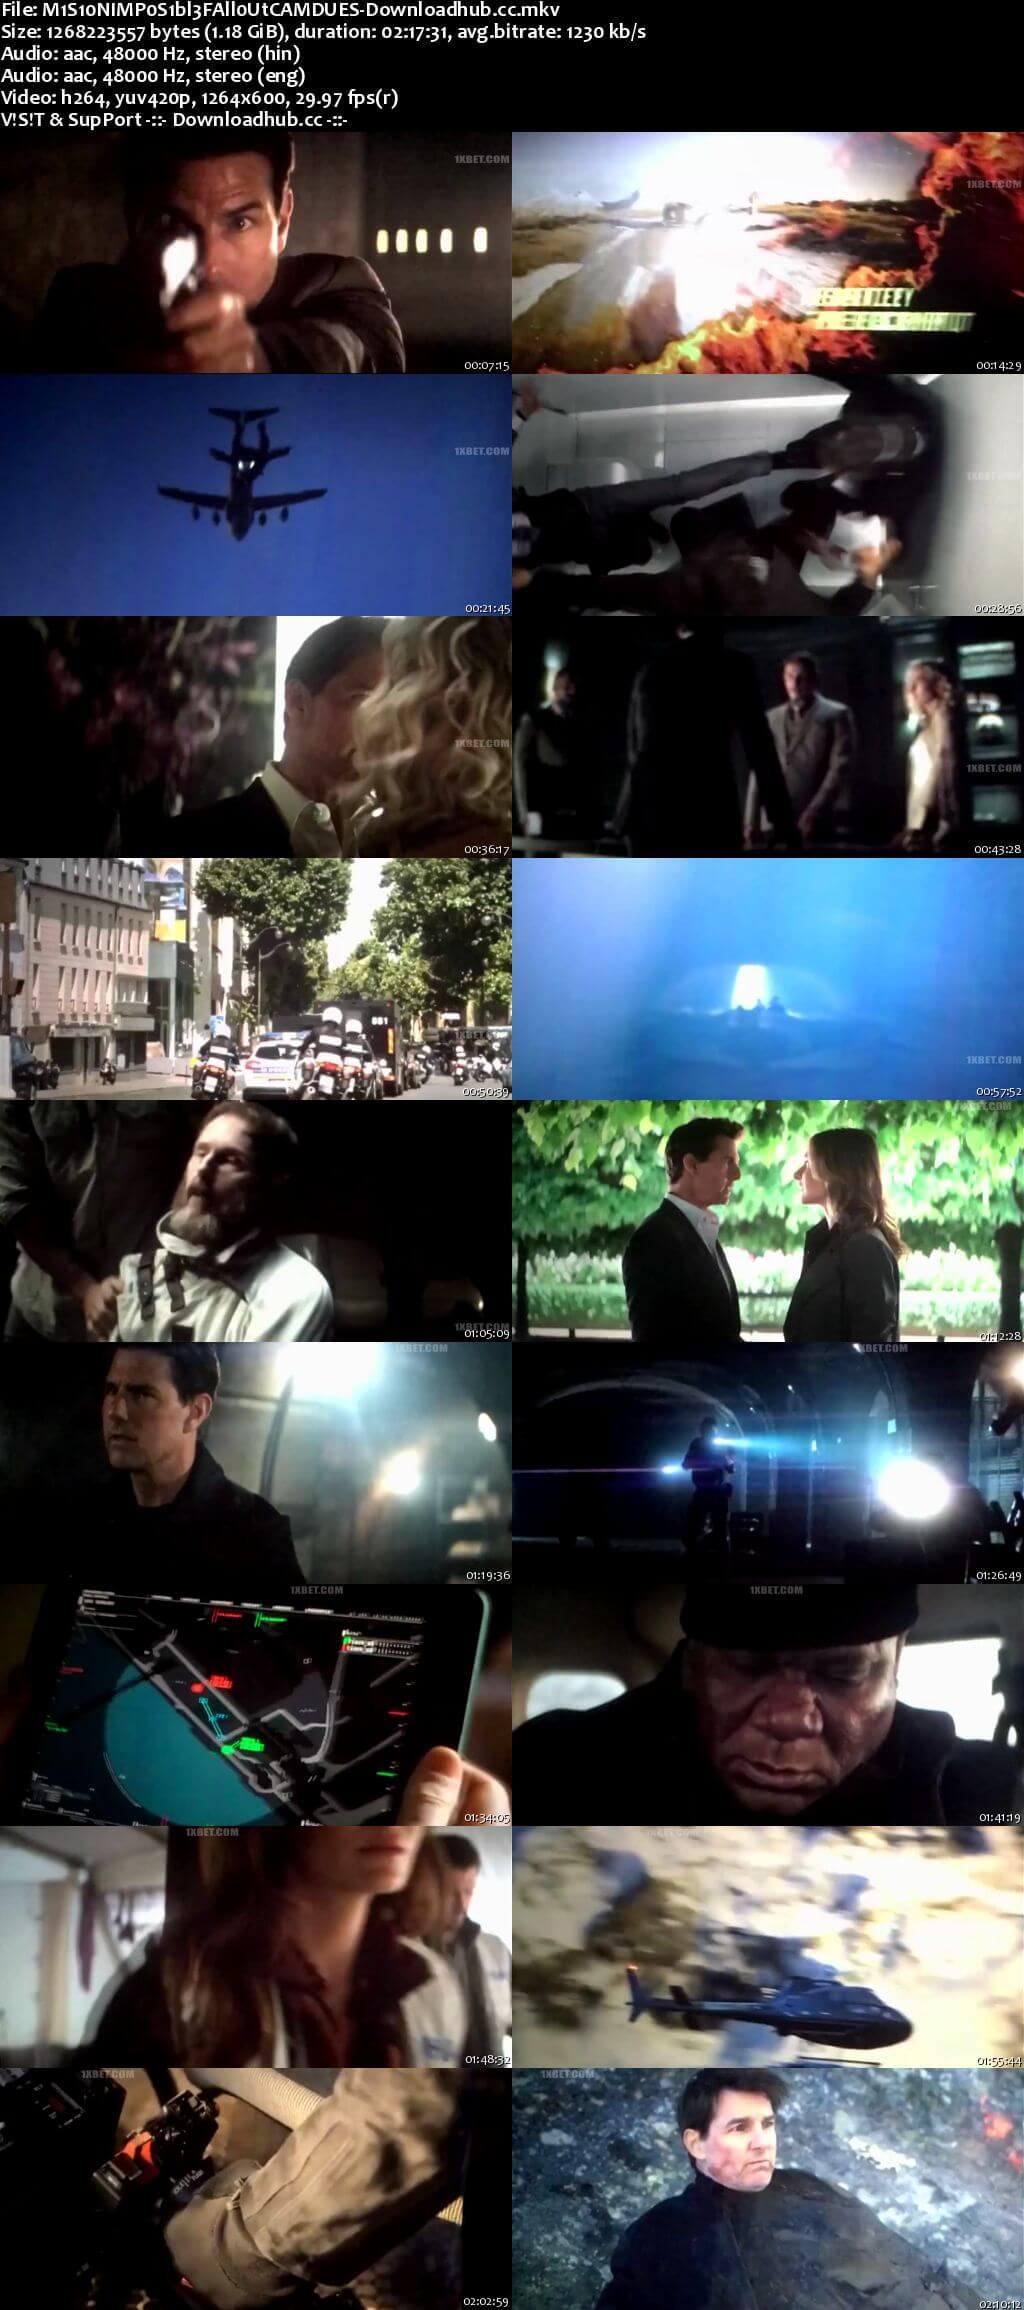 Mission Impossible - Fallout 2018 Dual Audio 720p HDCAM [Hindi - English]